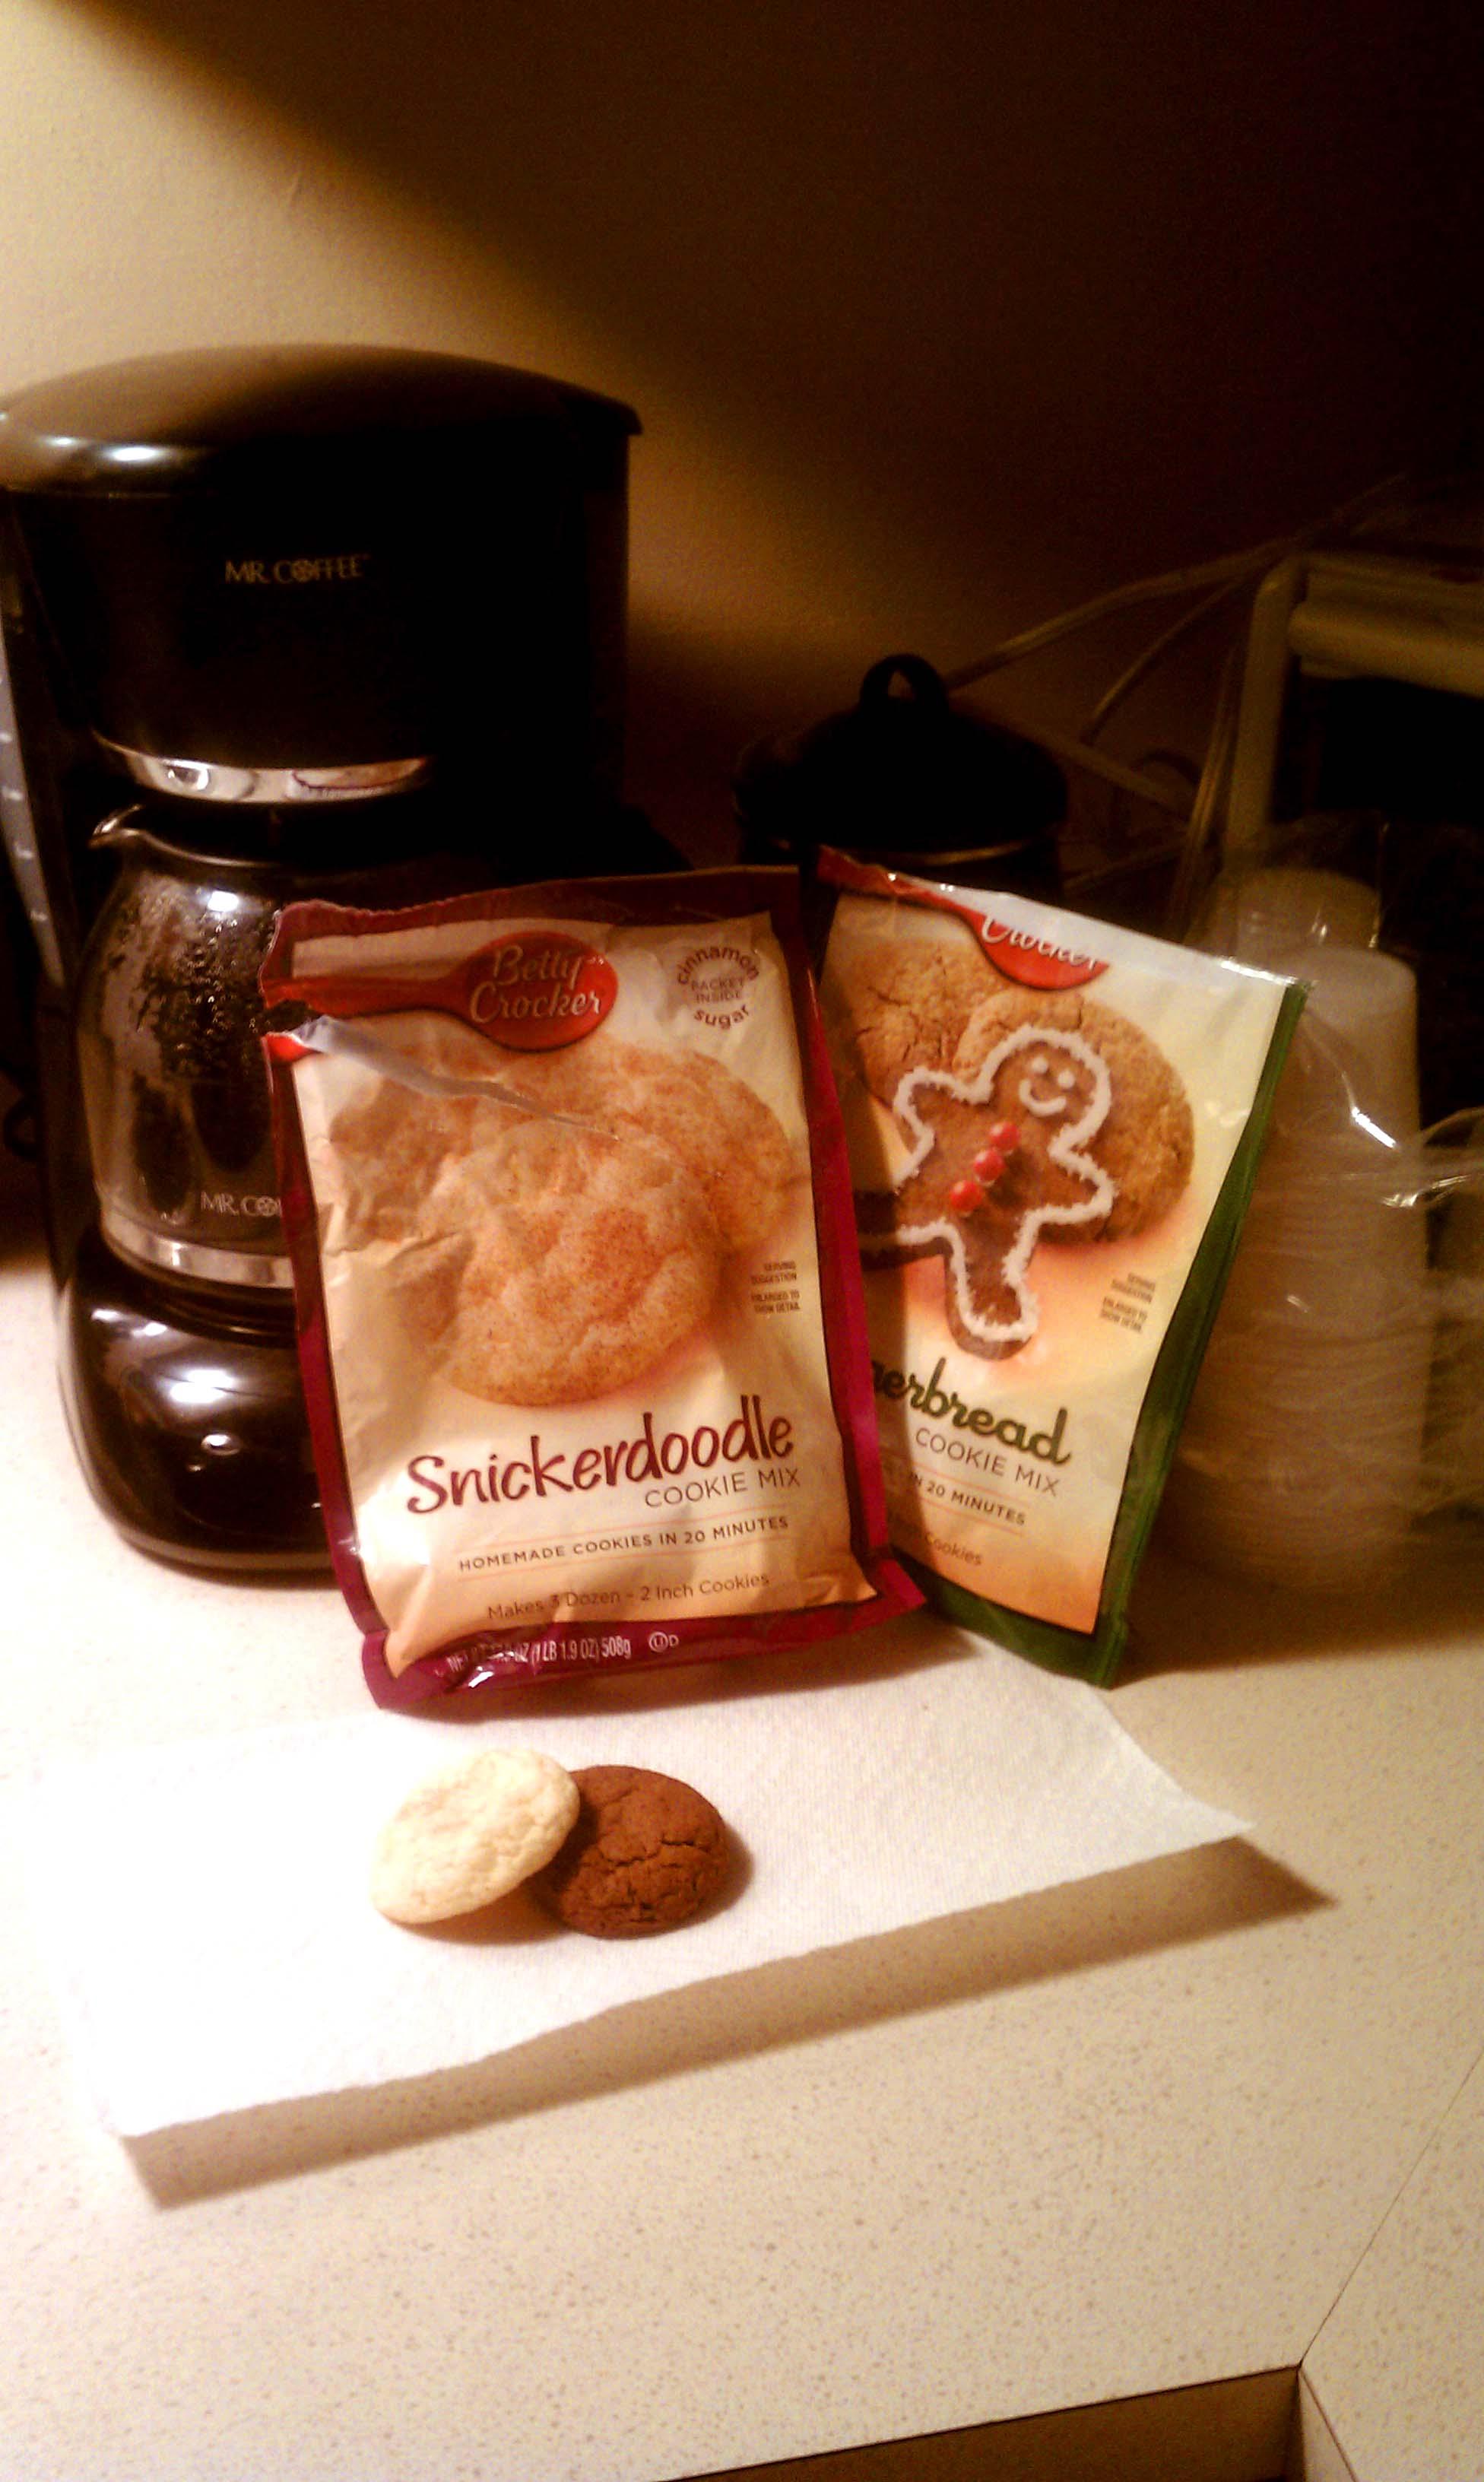 betty crocker snickerdoodle cookie mix instructions